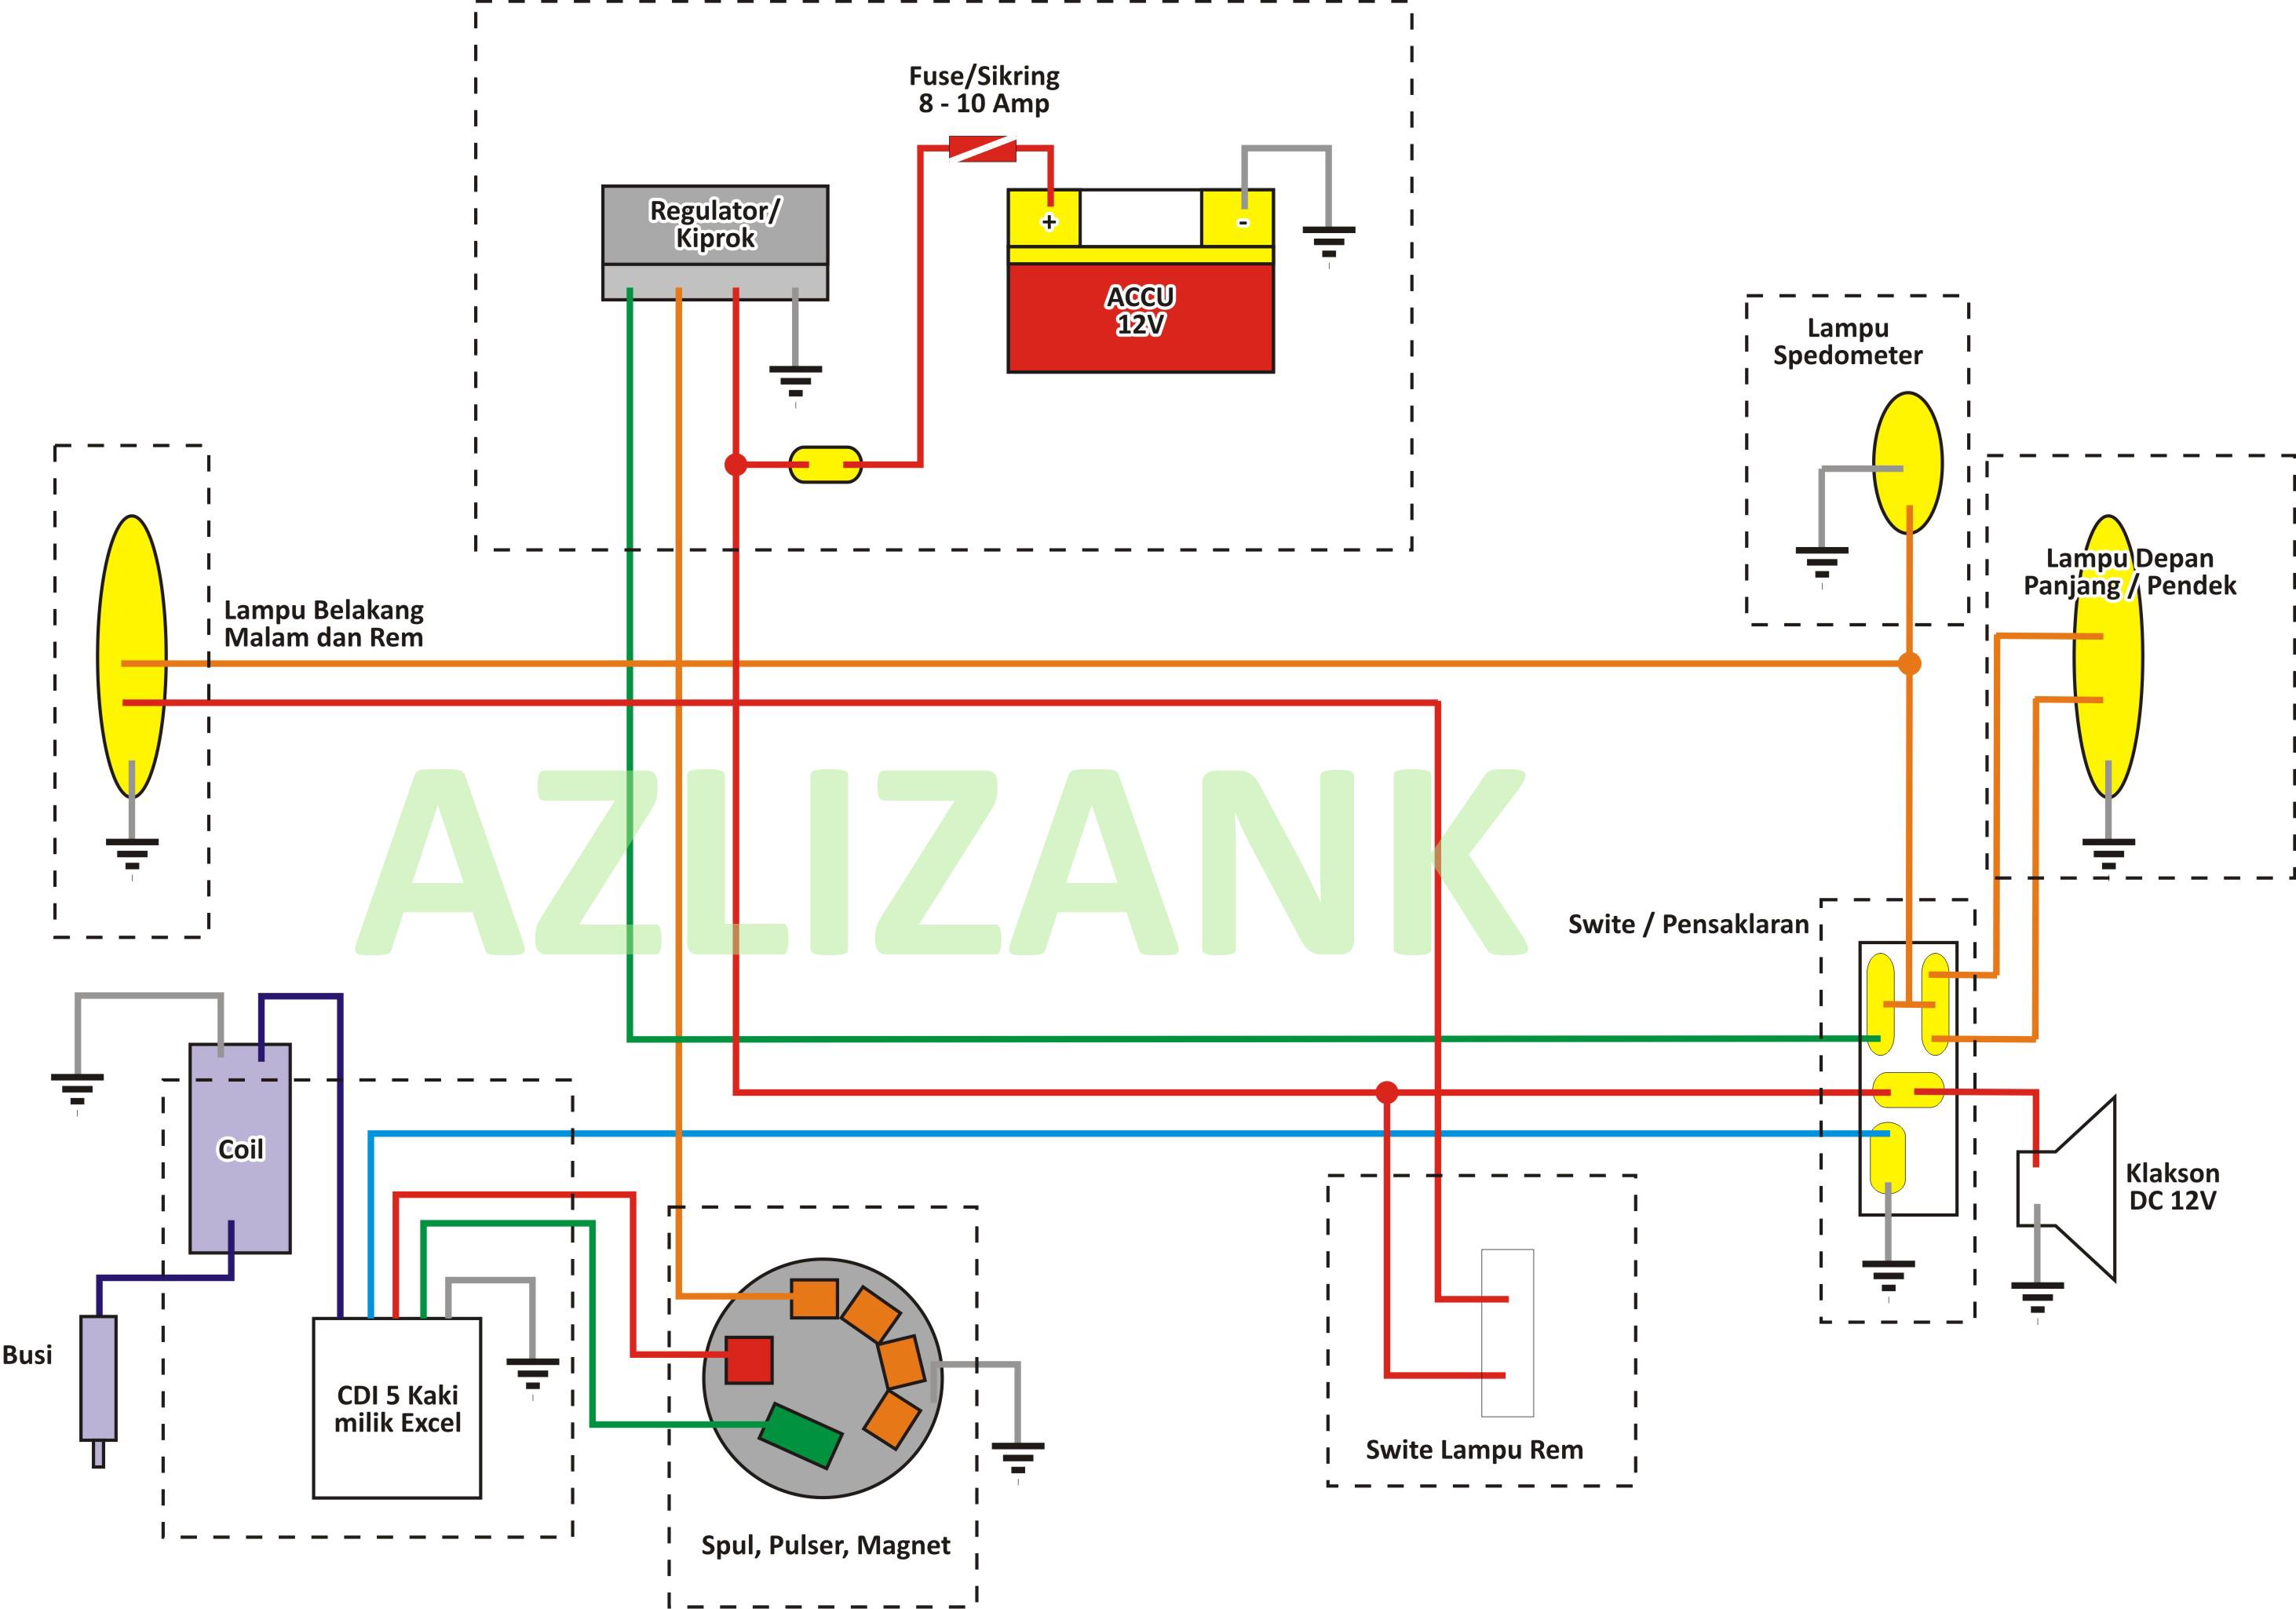 hight resolution of vespa vo wiring diagram wiring library tao tao 50cc moped wiring diagram vespa vo moped wiring diagram